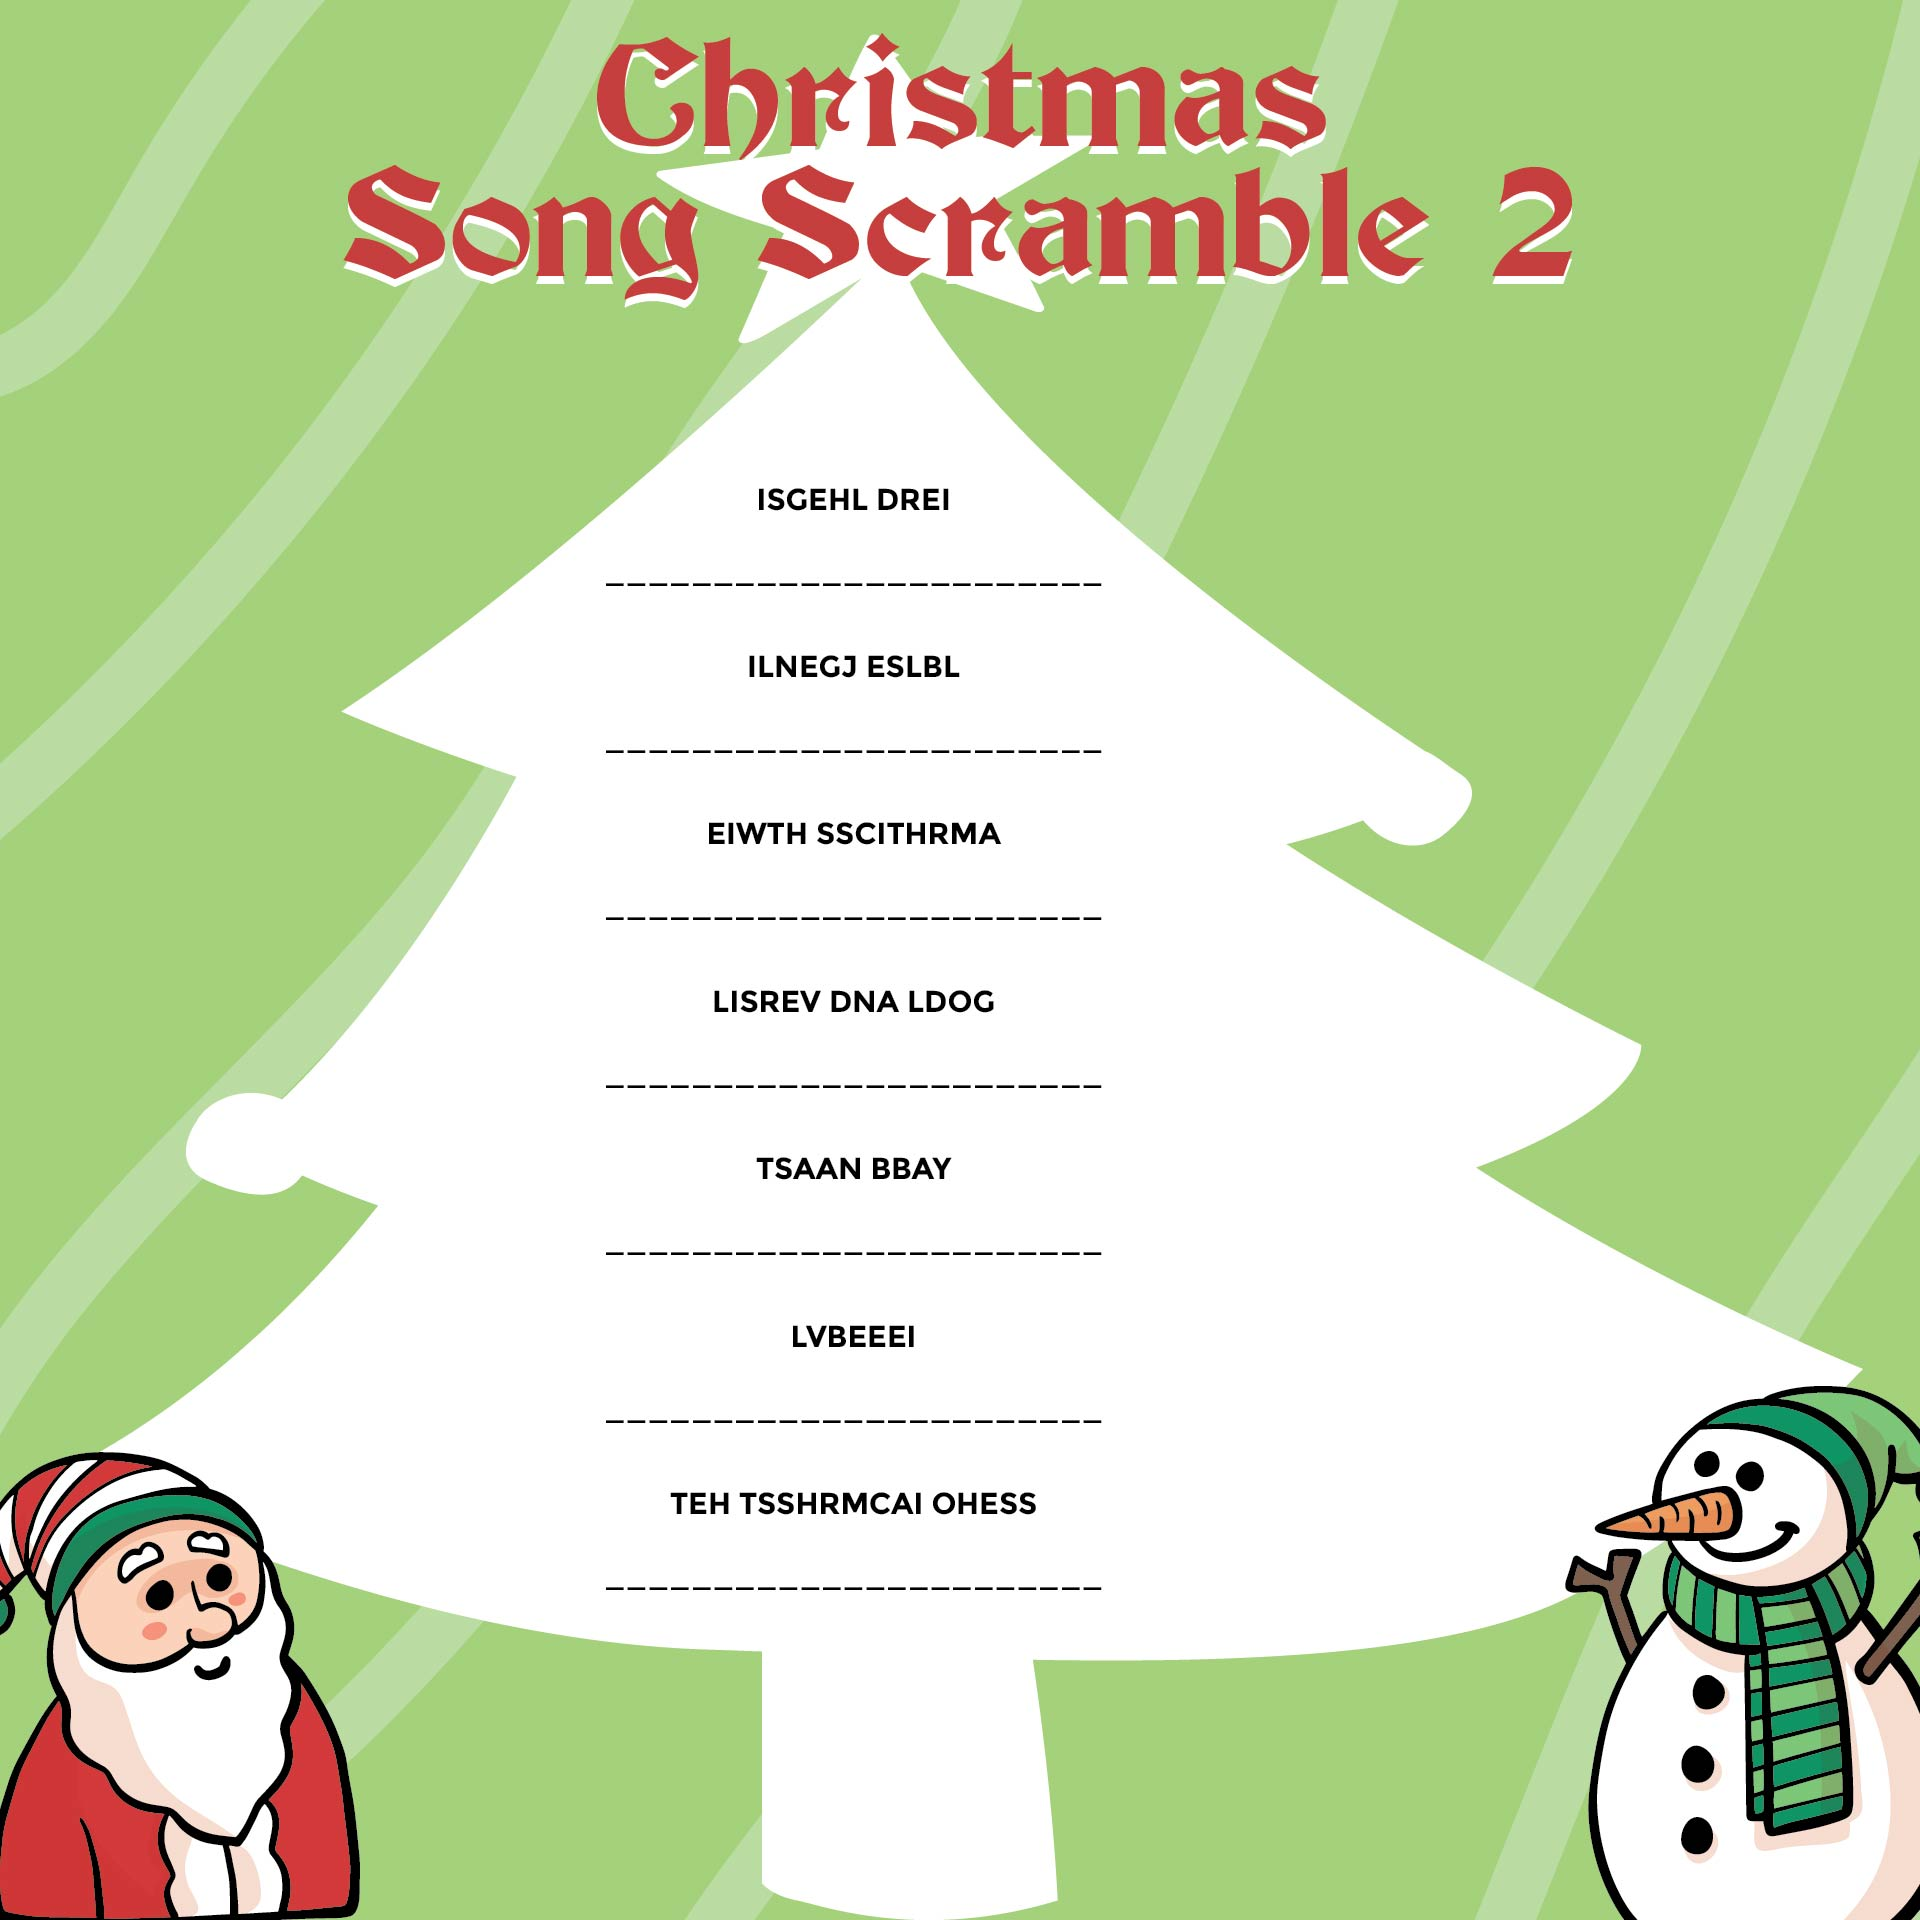 2 Christmas Song Scramble Answers